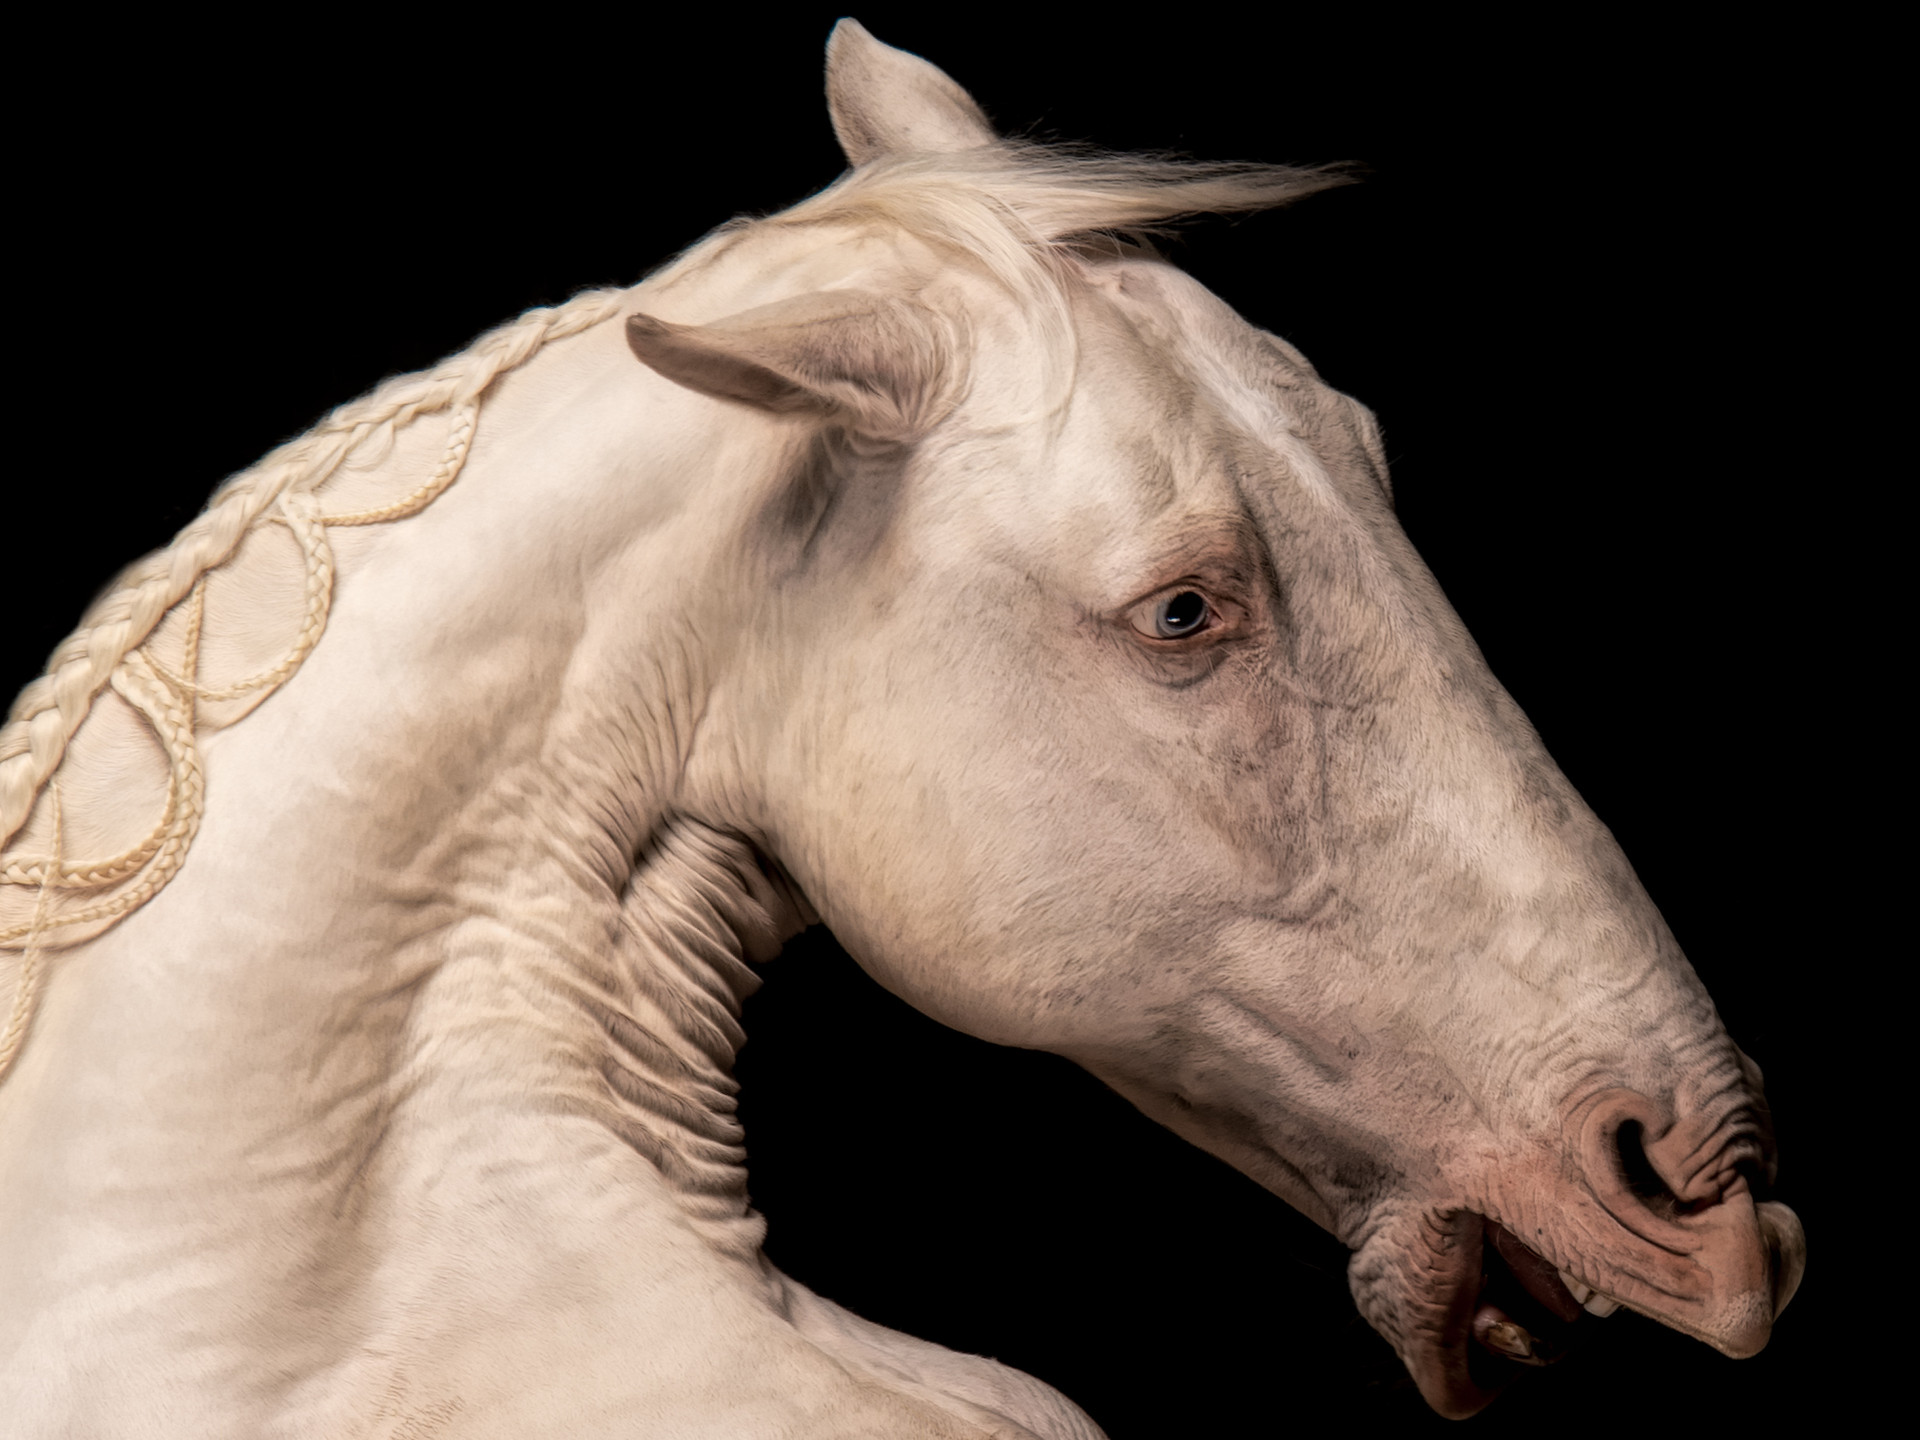 Toureiro (Bullfighter)